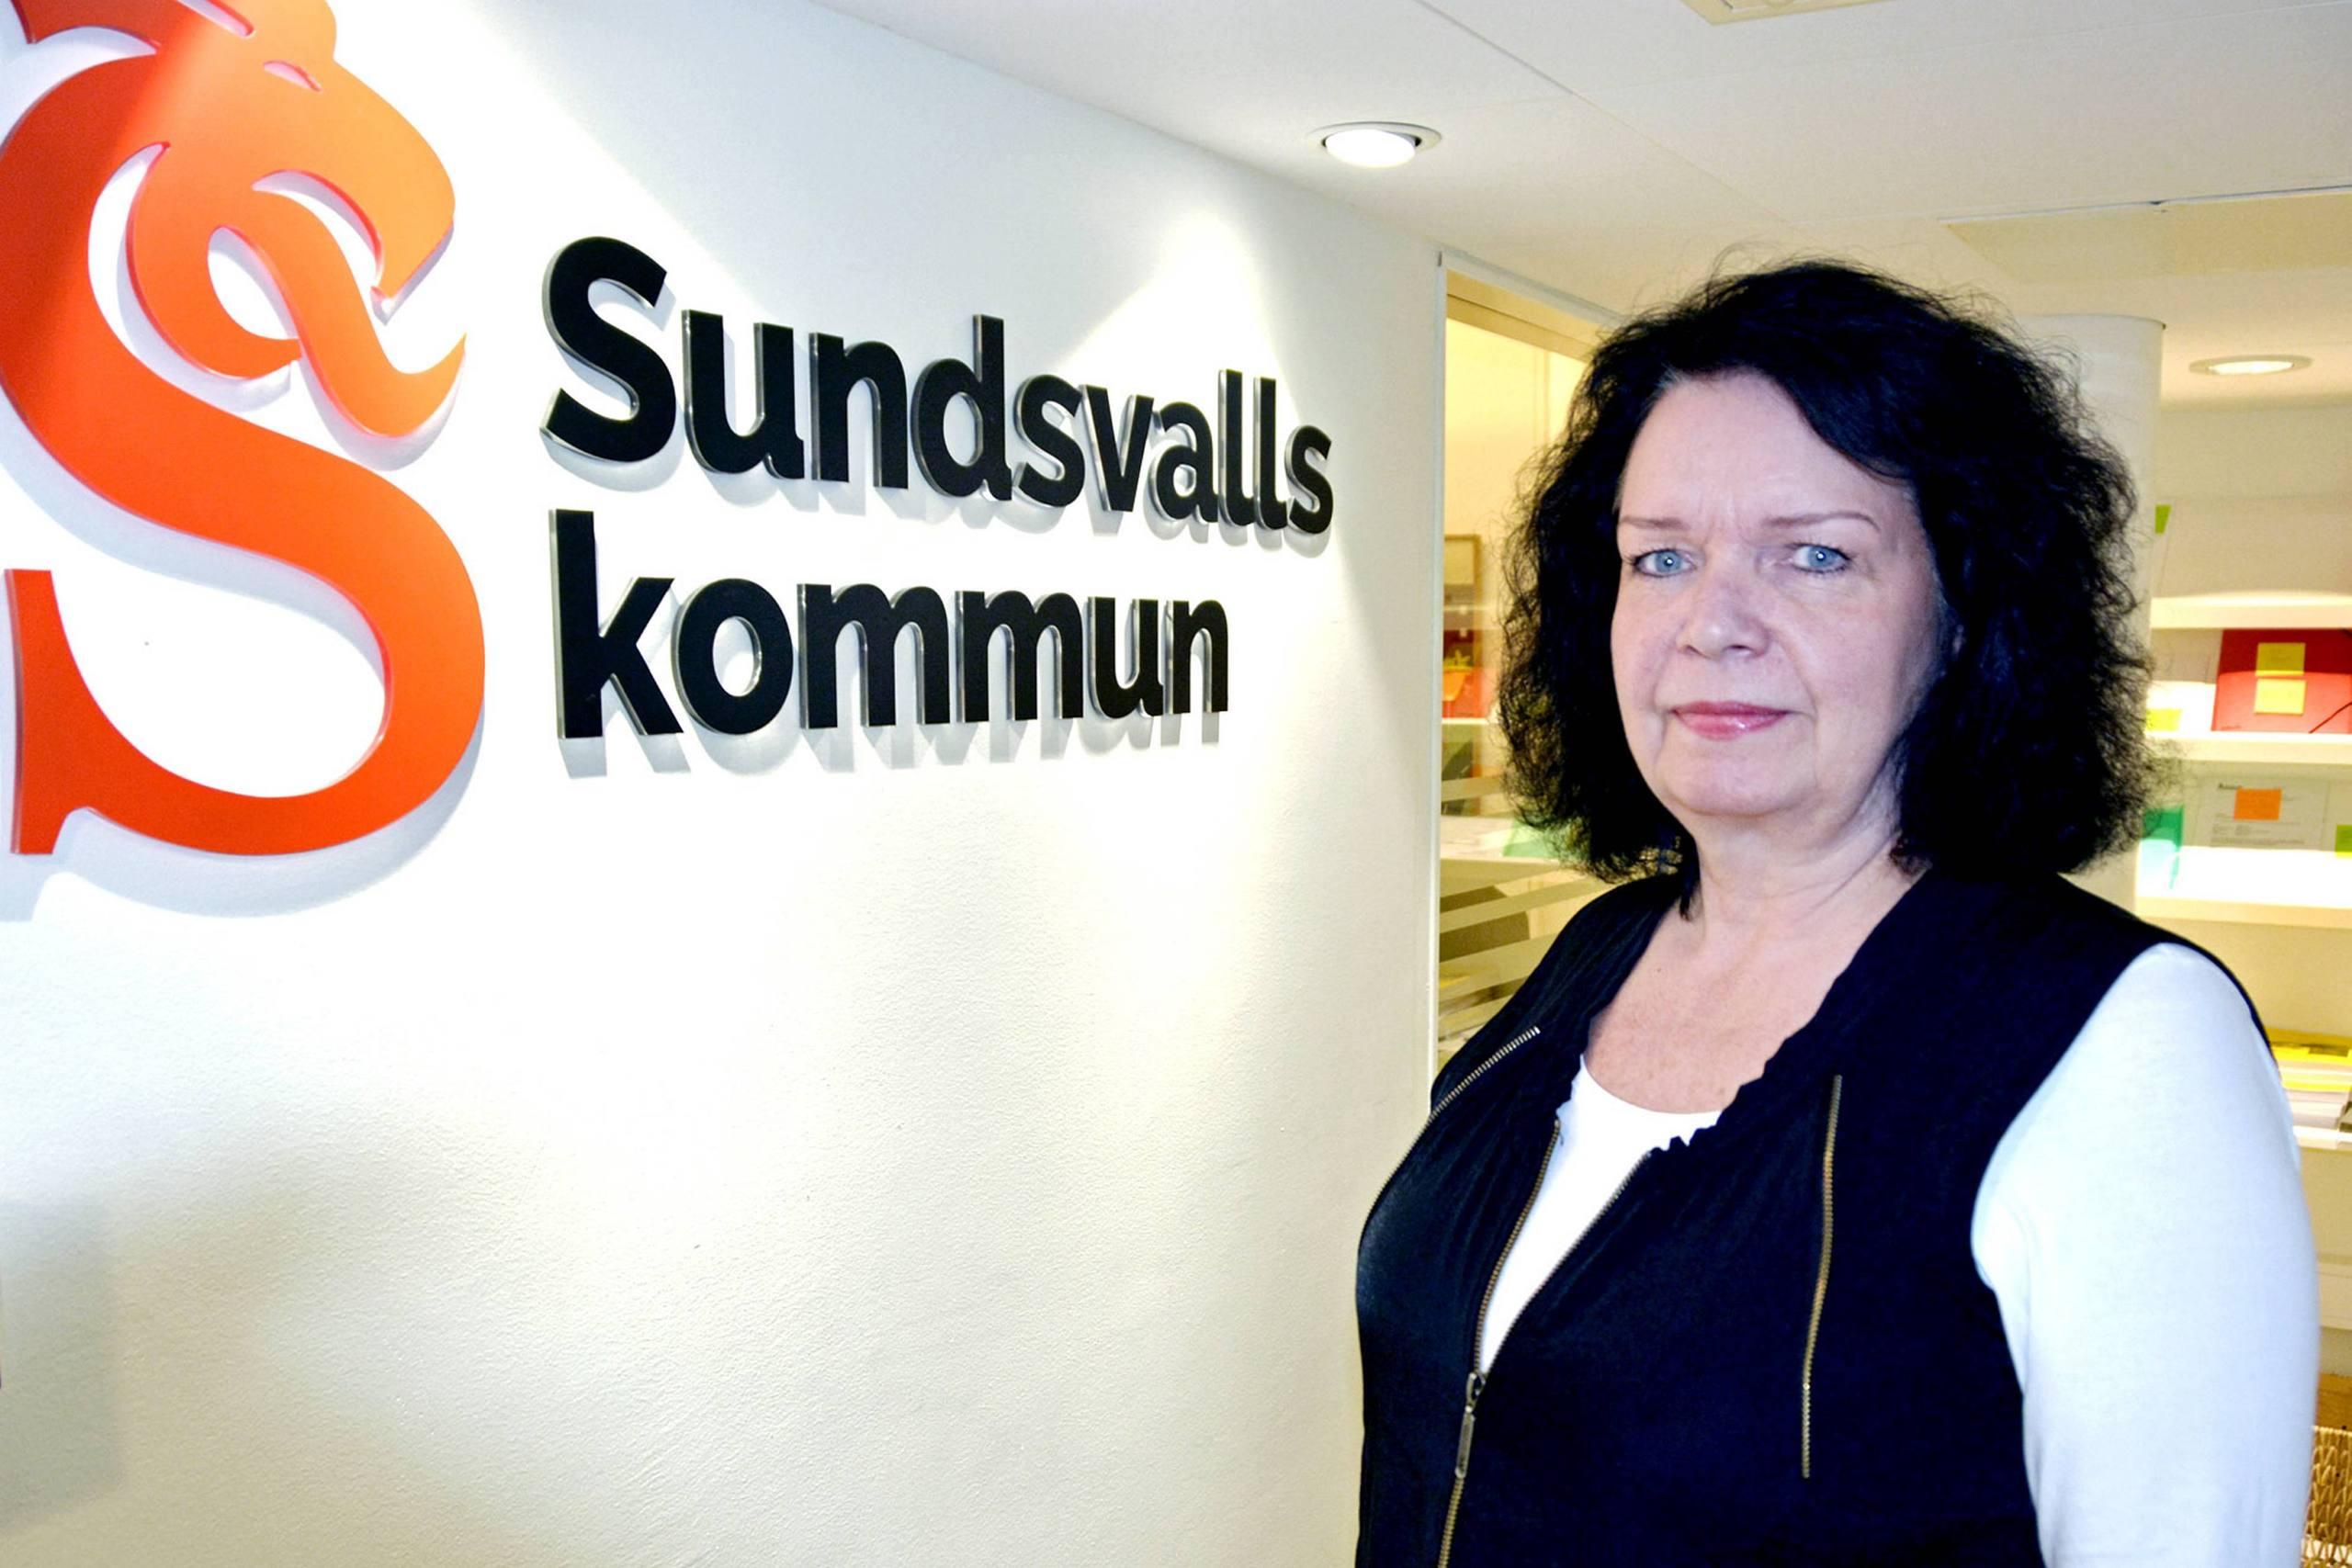 Sundsvall kommun hemtjänst